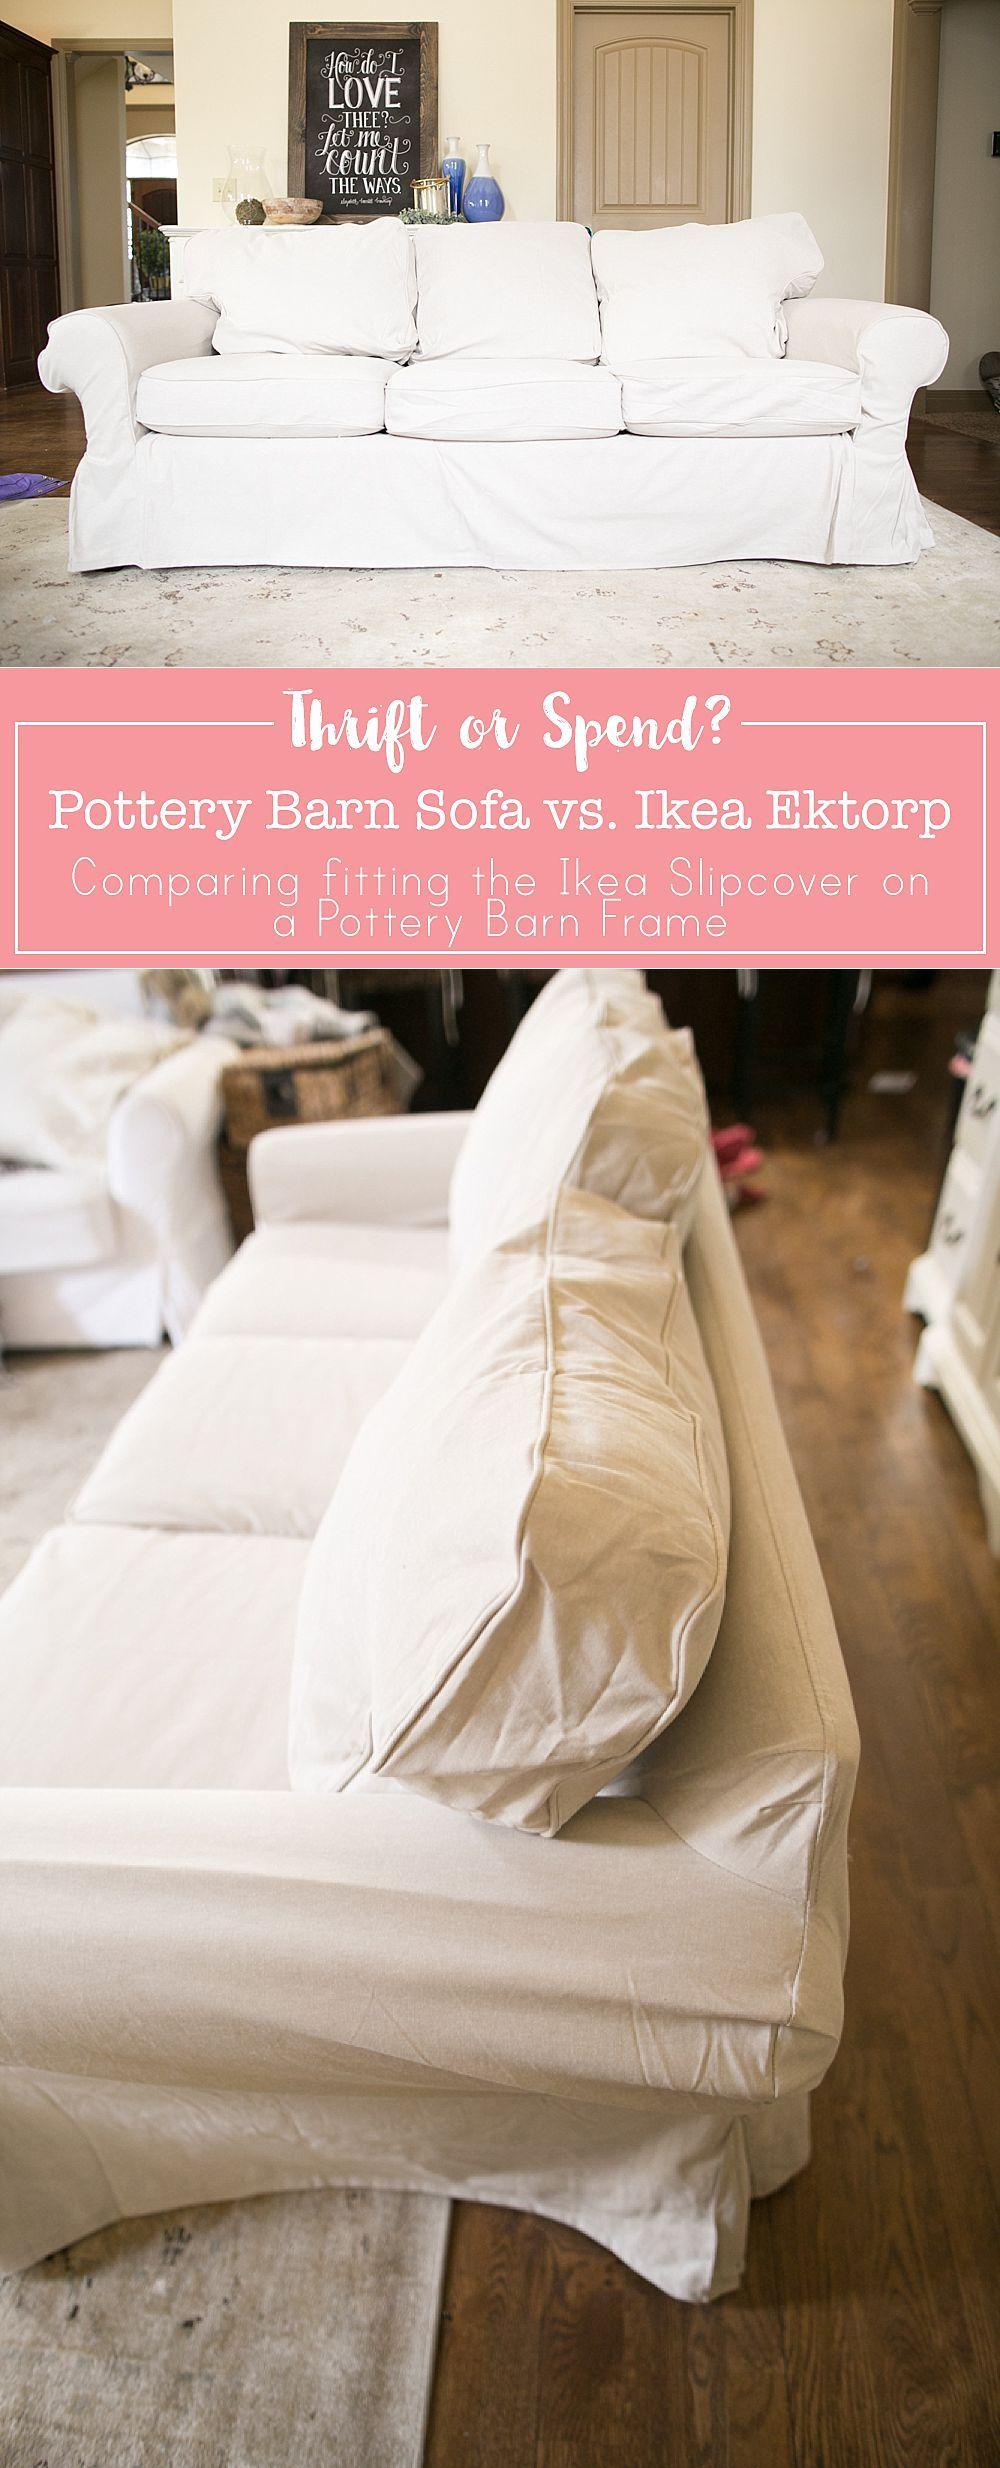 Ikea Ektorp Sofa Cover On A Pottery Barn Frame Ektorp Sofa Cover